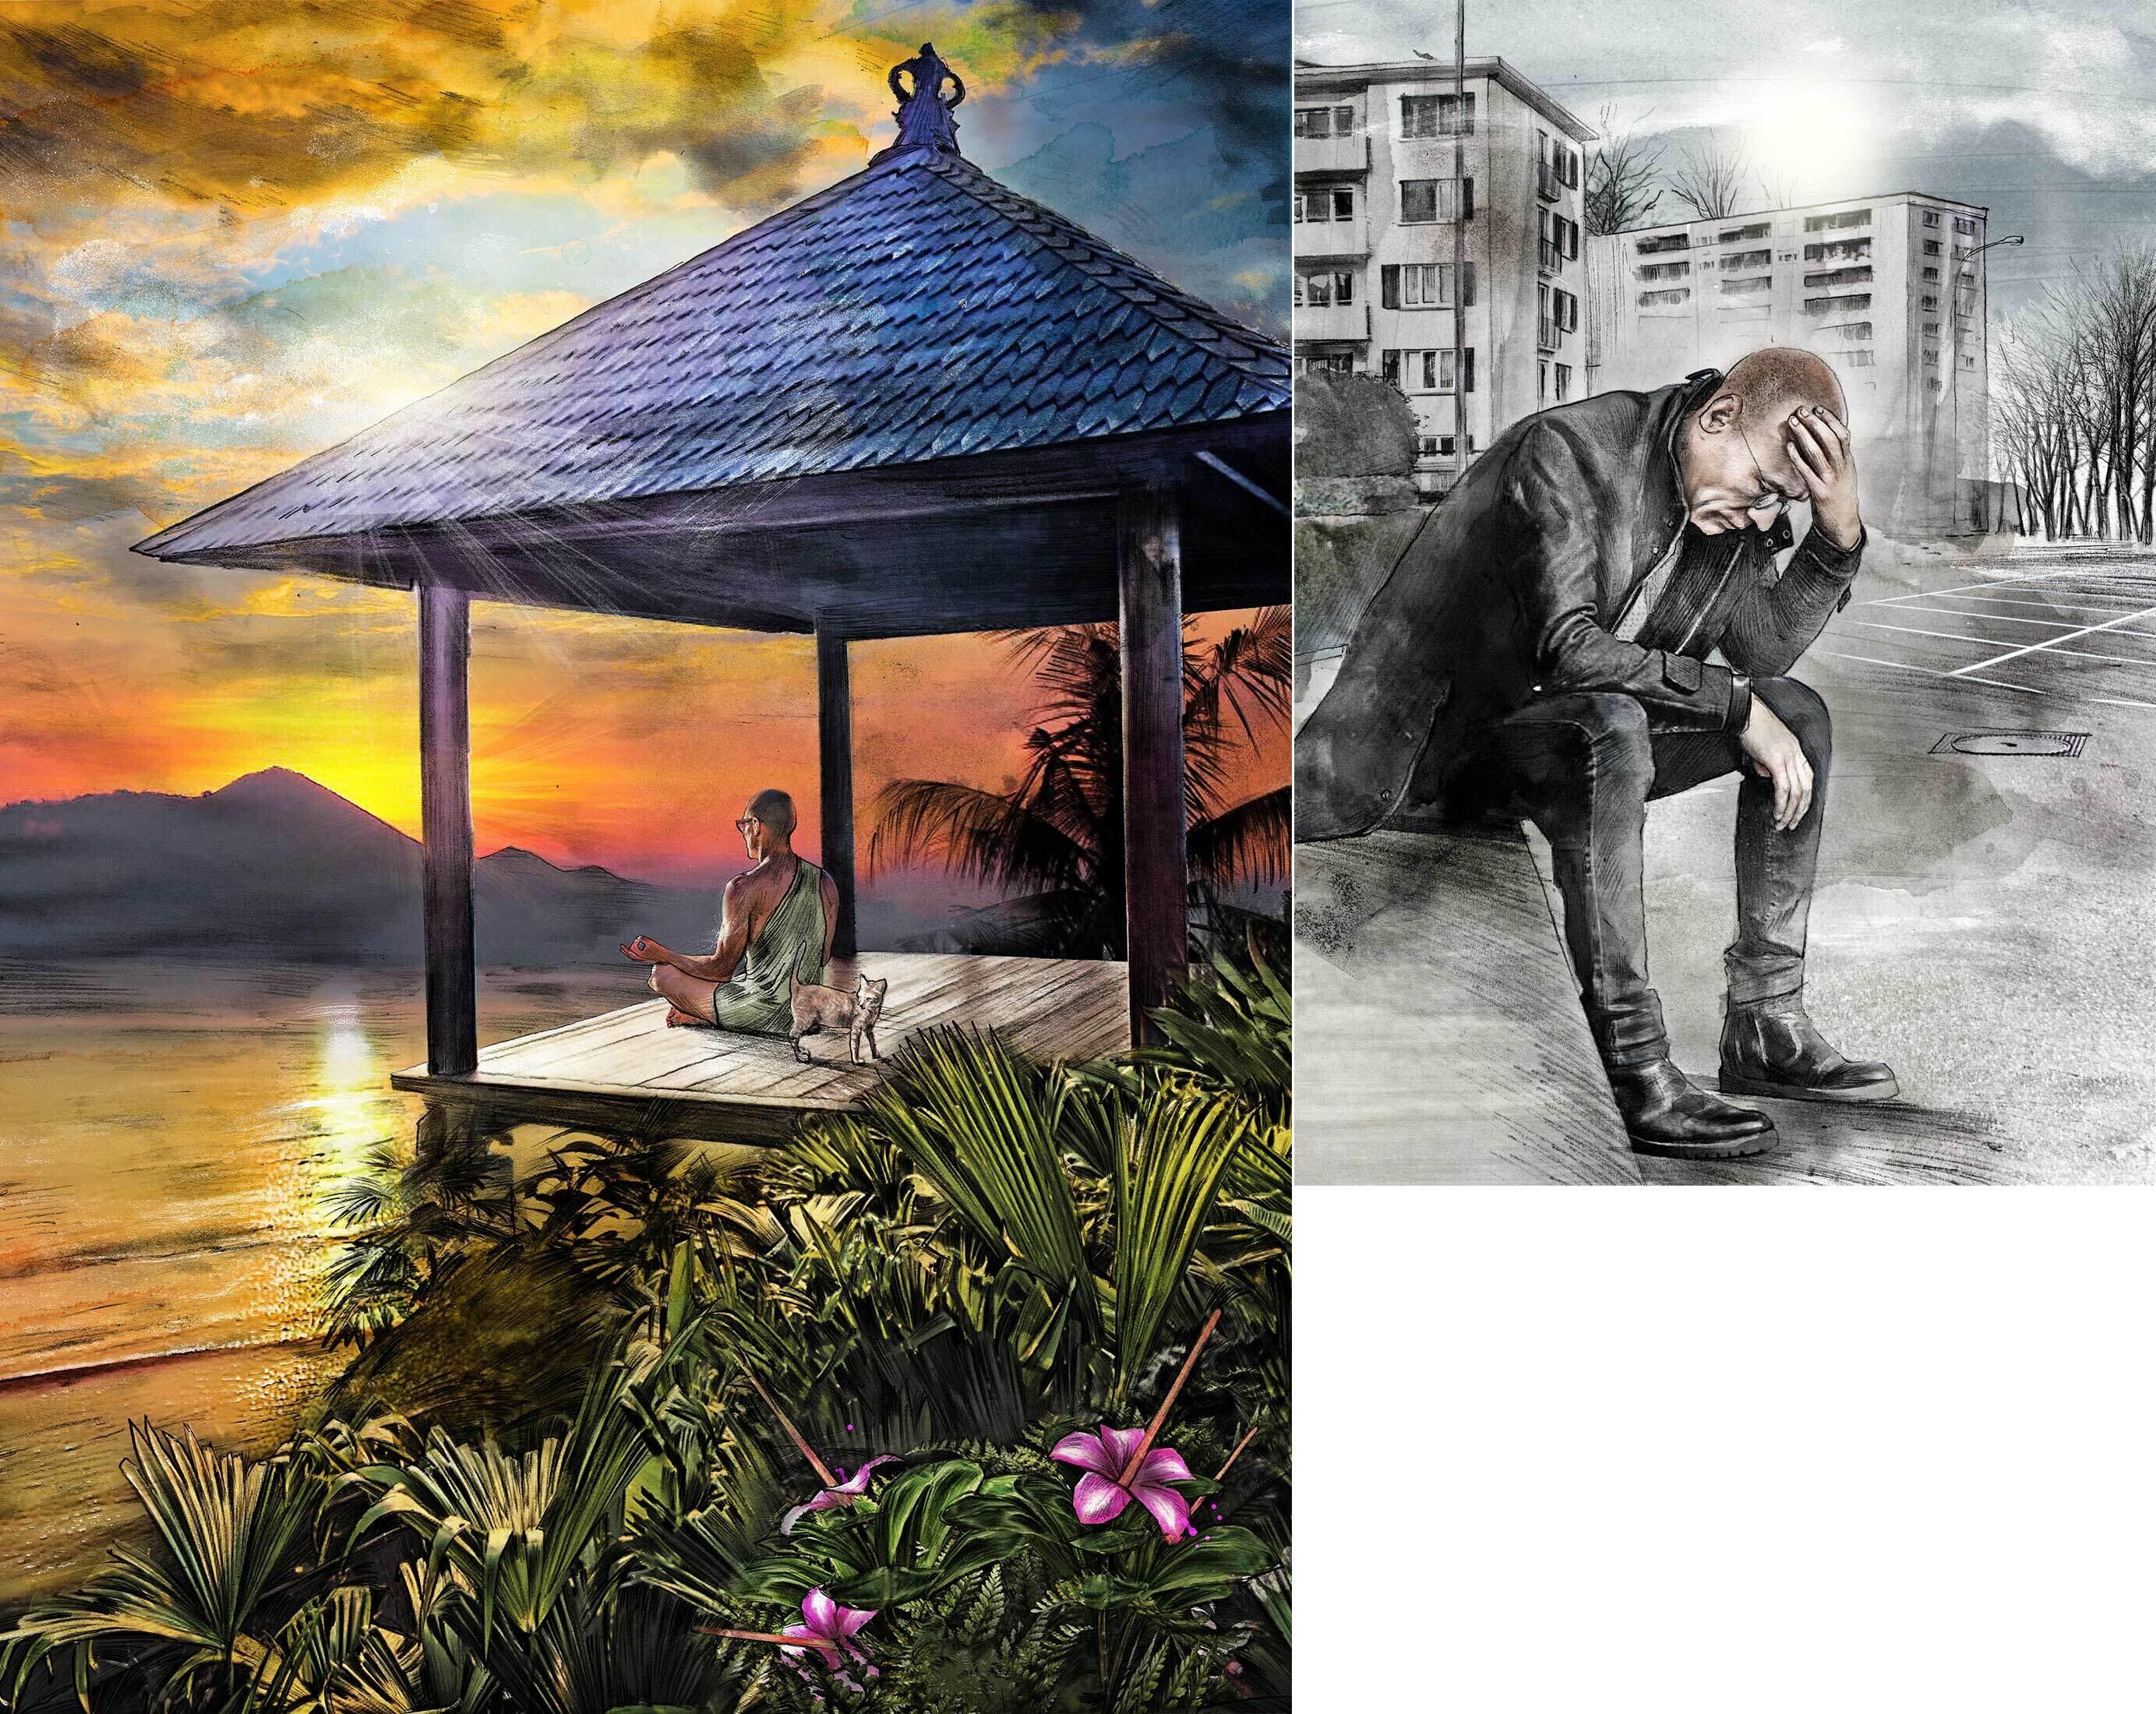 Lombok indonesia illustration meditation sunset - Kornel Illustration | Kornel Stadler portfolio